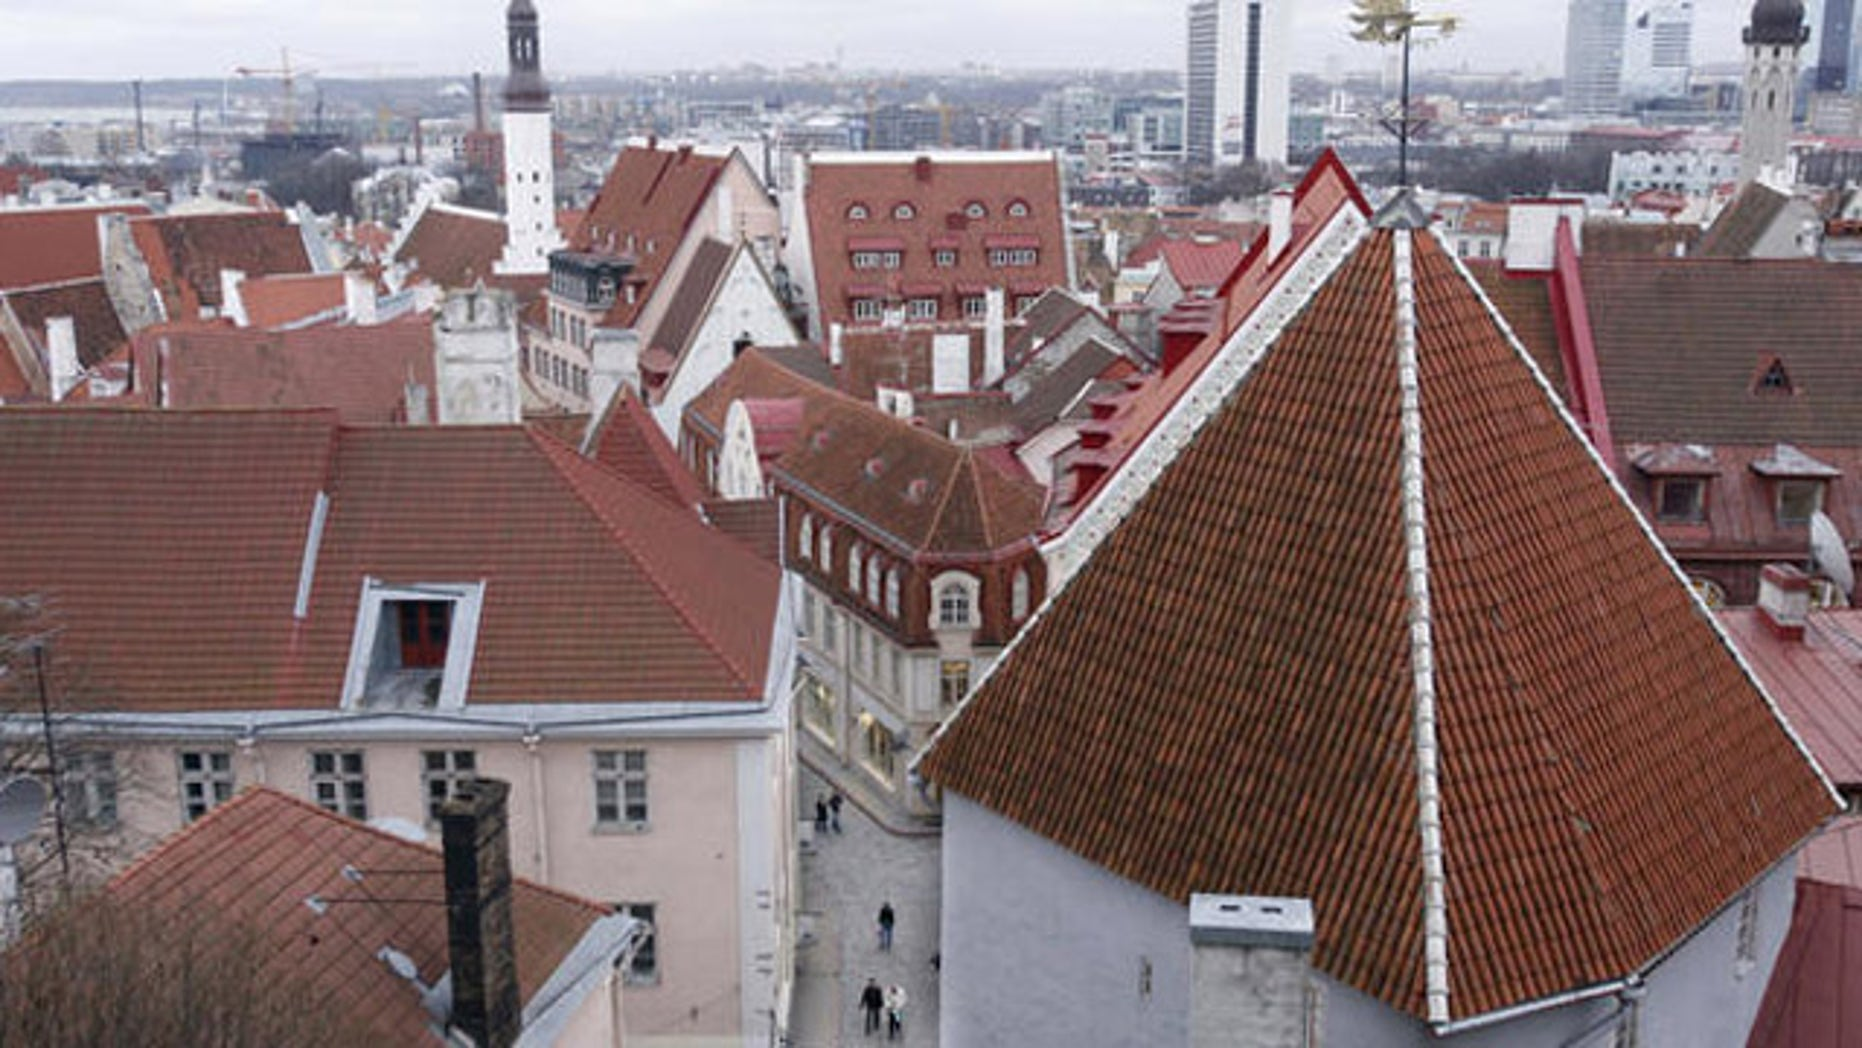 A view of the old town Tallinn, Estonia.